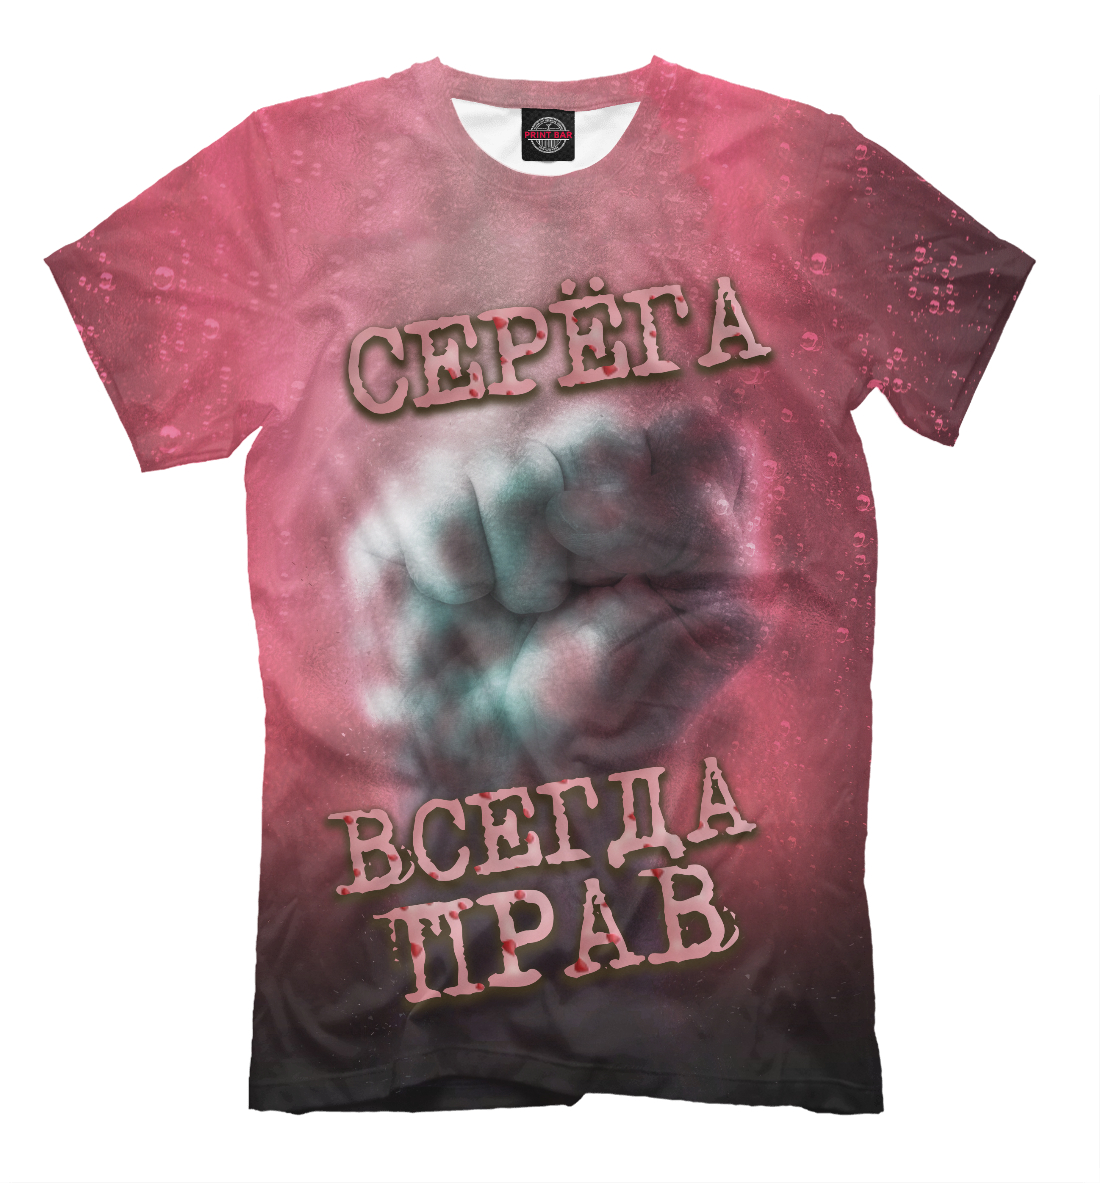 Купить Серега всегда прав, Printbar, Футболки, IMR-942428-fut-2